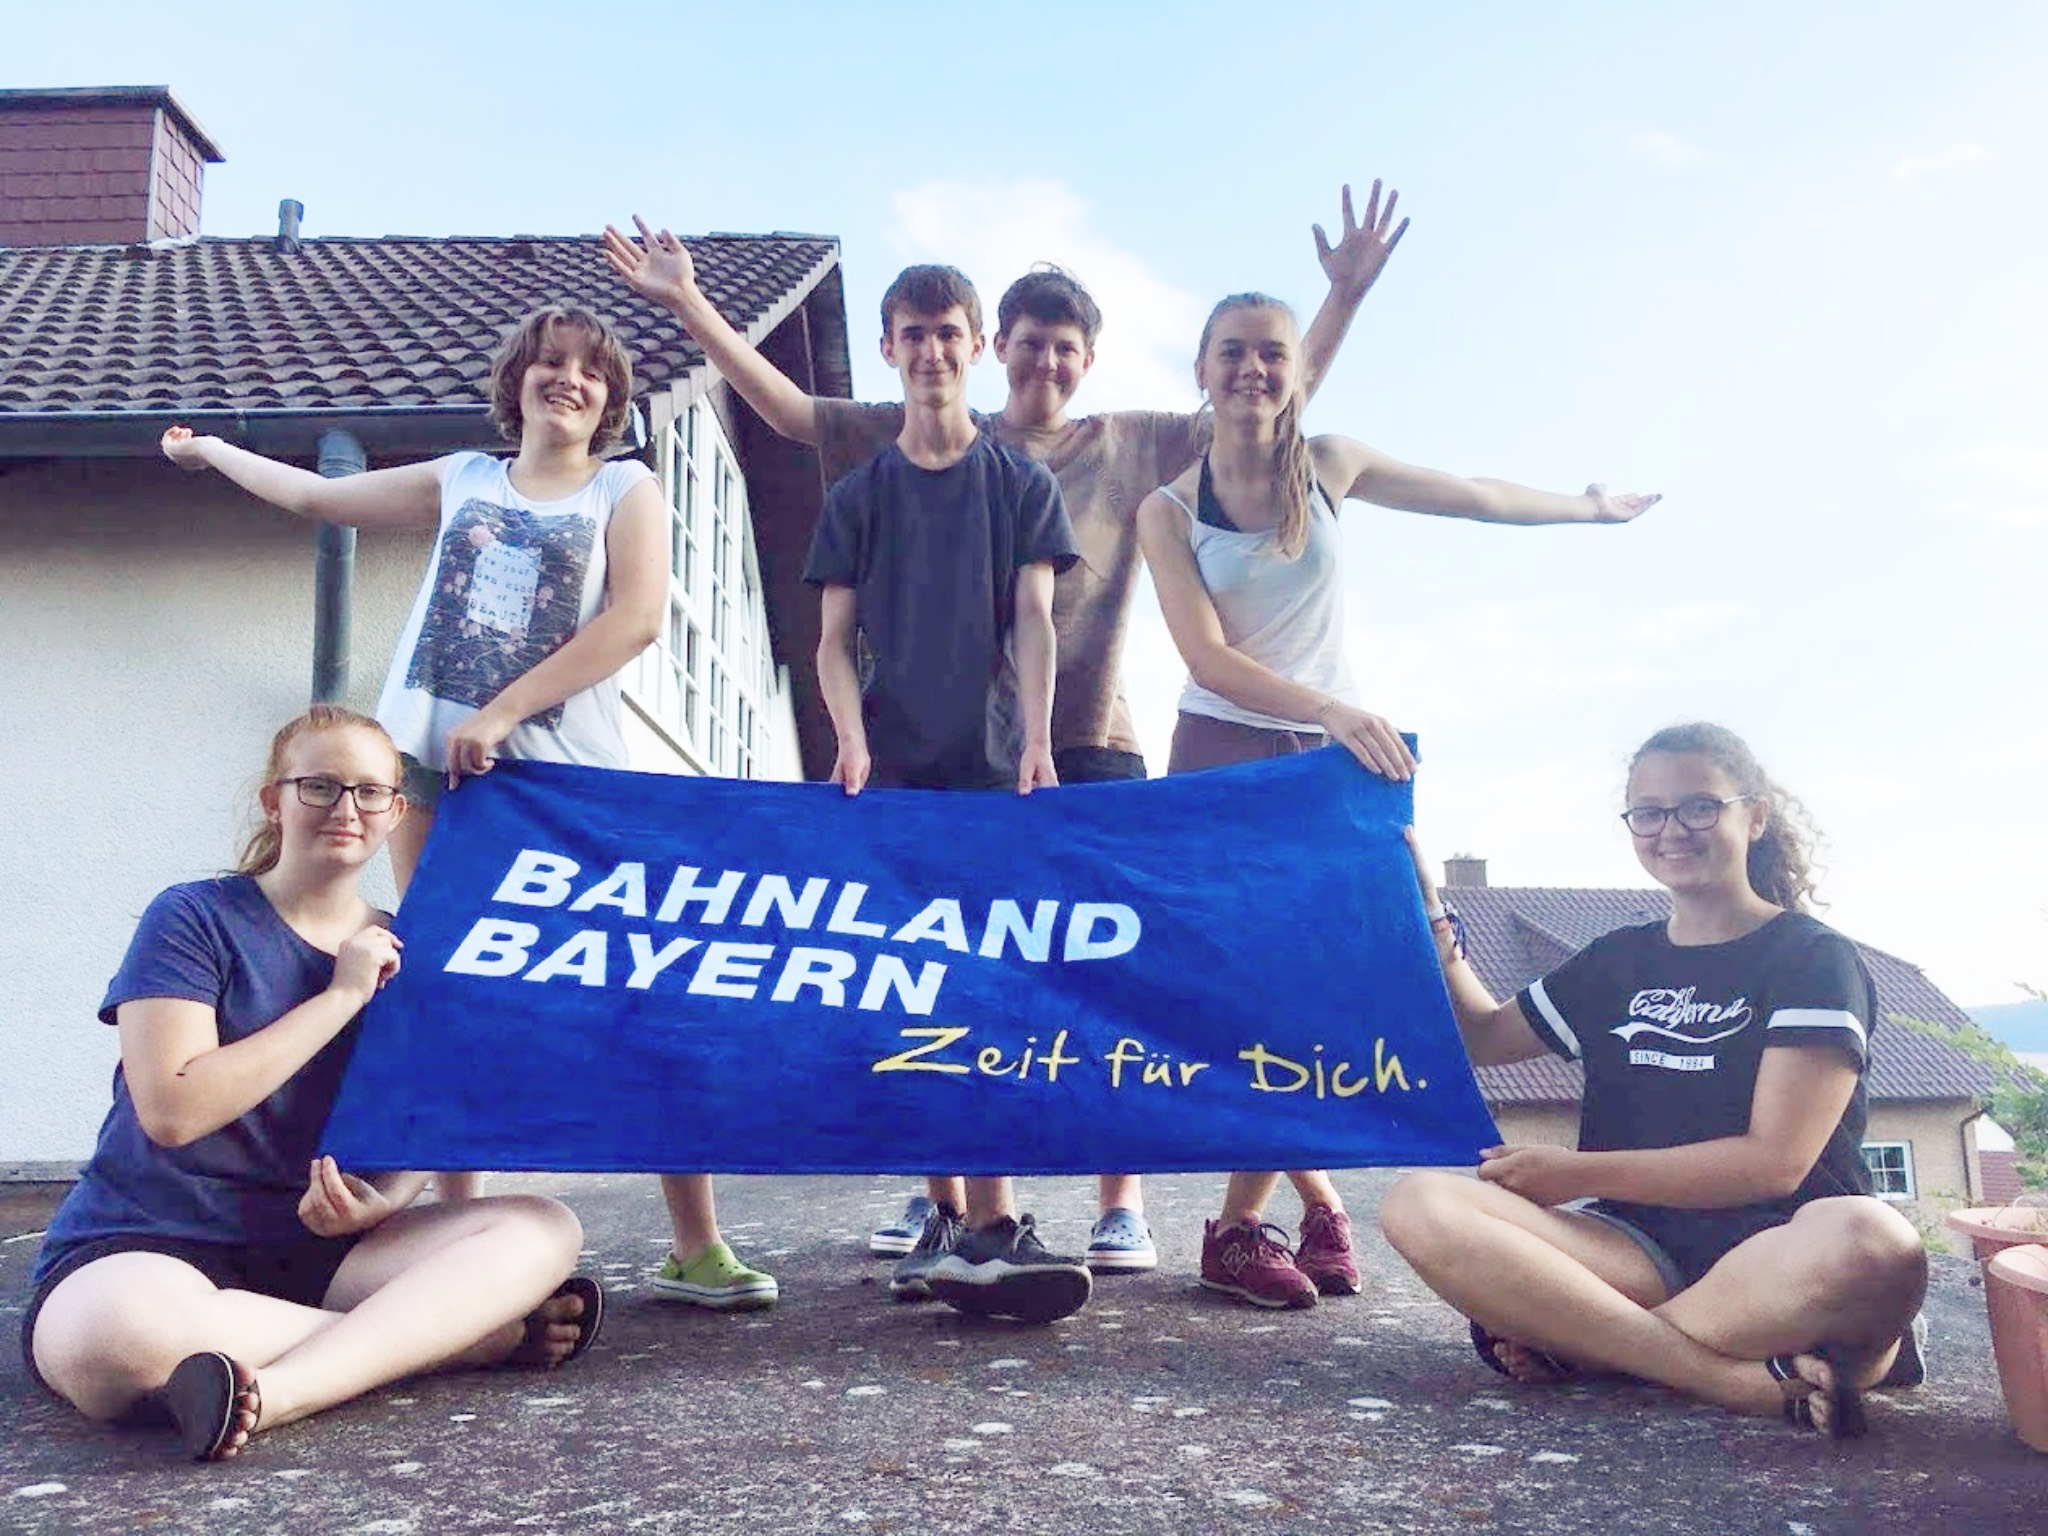 Bahnland Bayern für Schüler. Foto: DB Regio AG